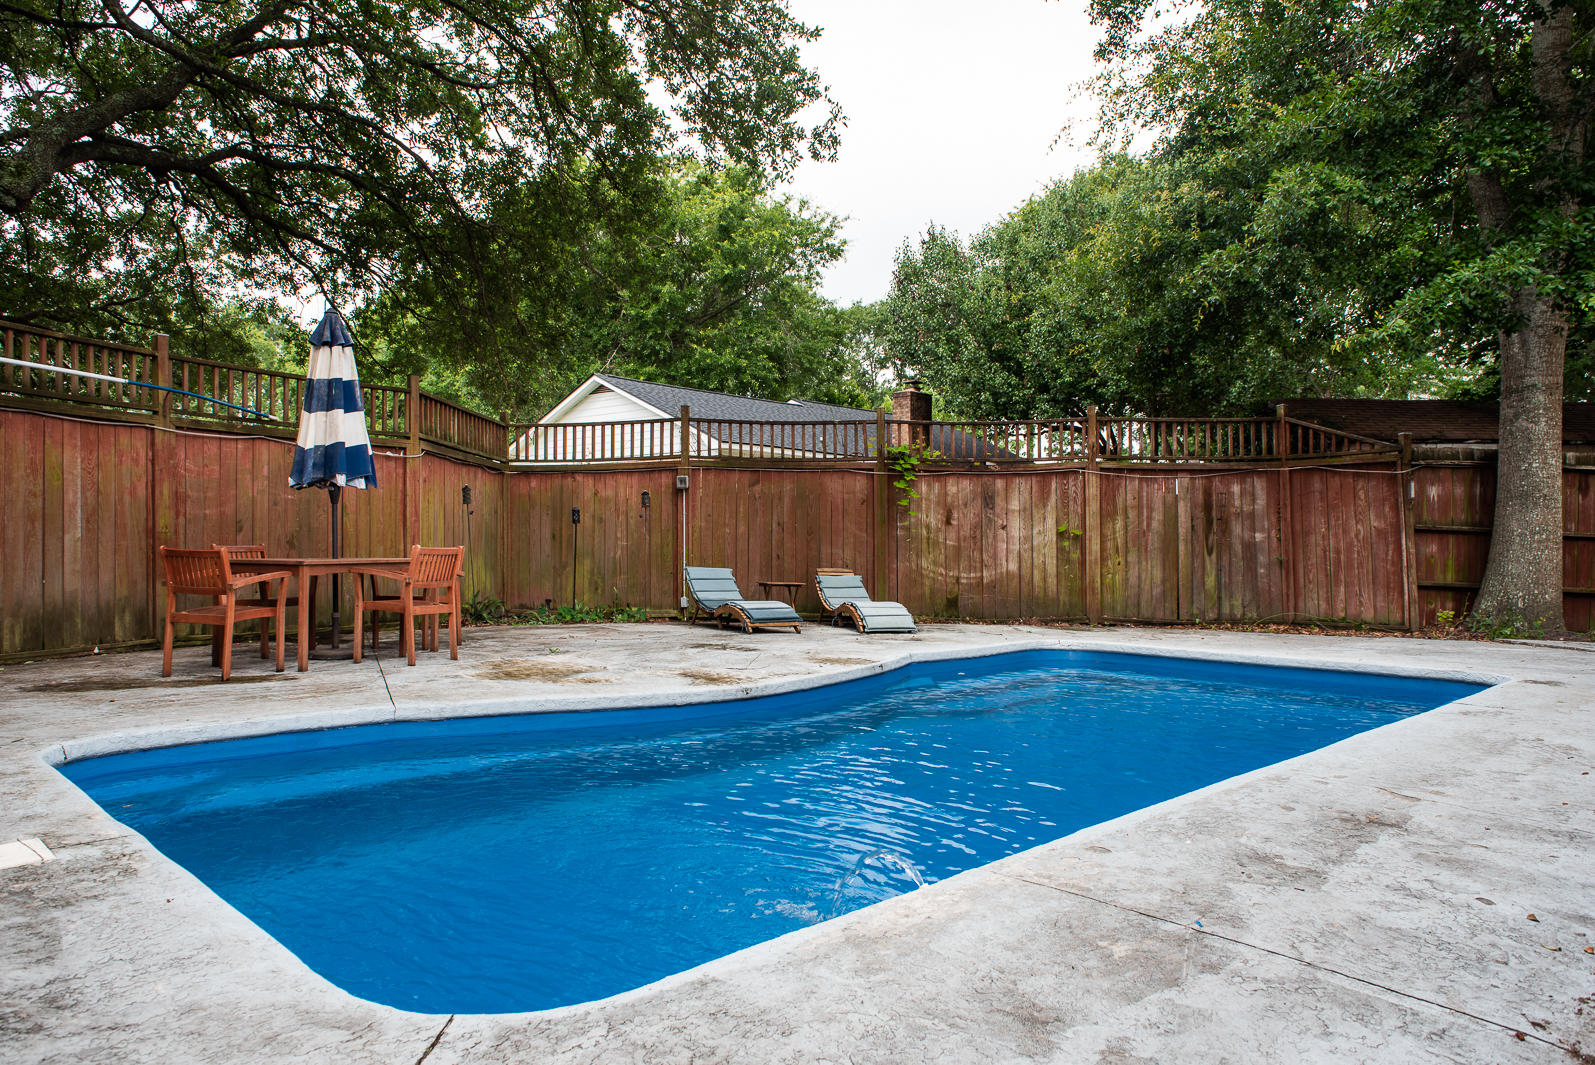 Wando East Homes For Sale - 1605 Babington, Mount Pleasant, SC - 0